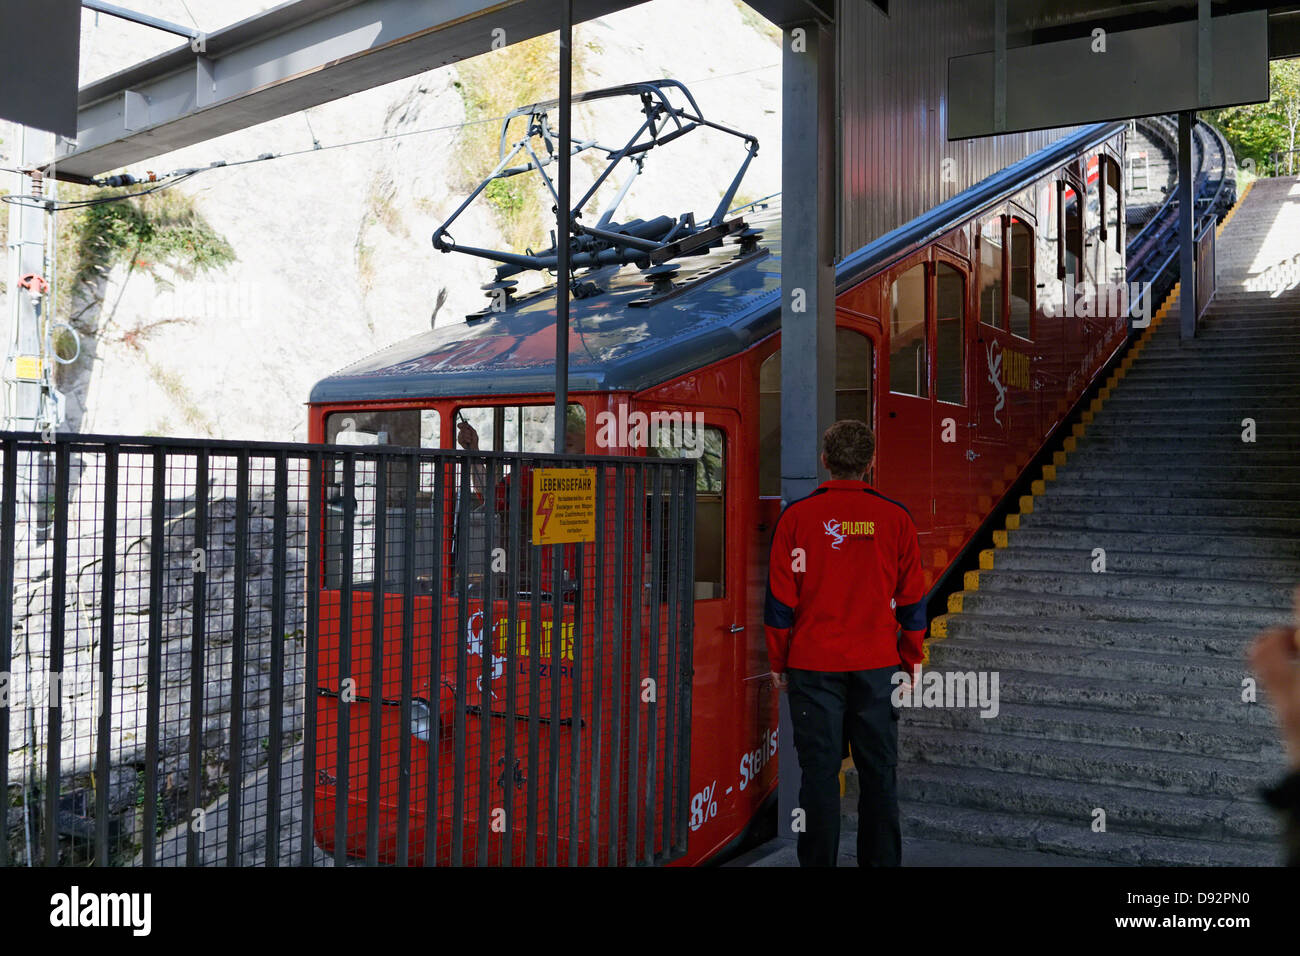 Cogwheel Train Station Ready to Ascend to Pilatus Mountain, Alpnachstad, Switzerland - Stock Image